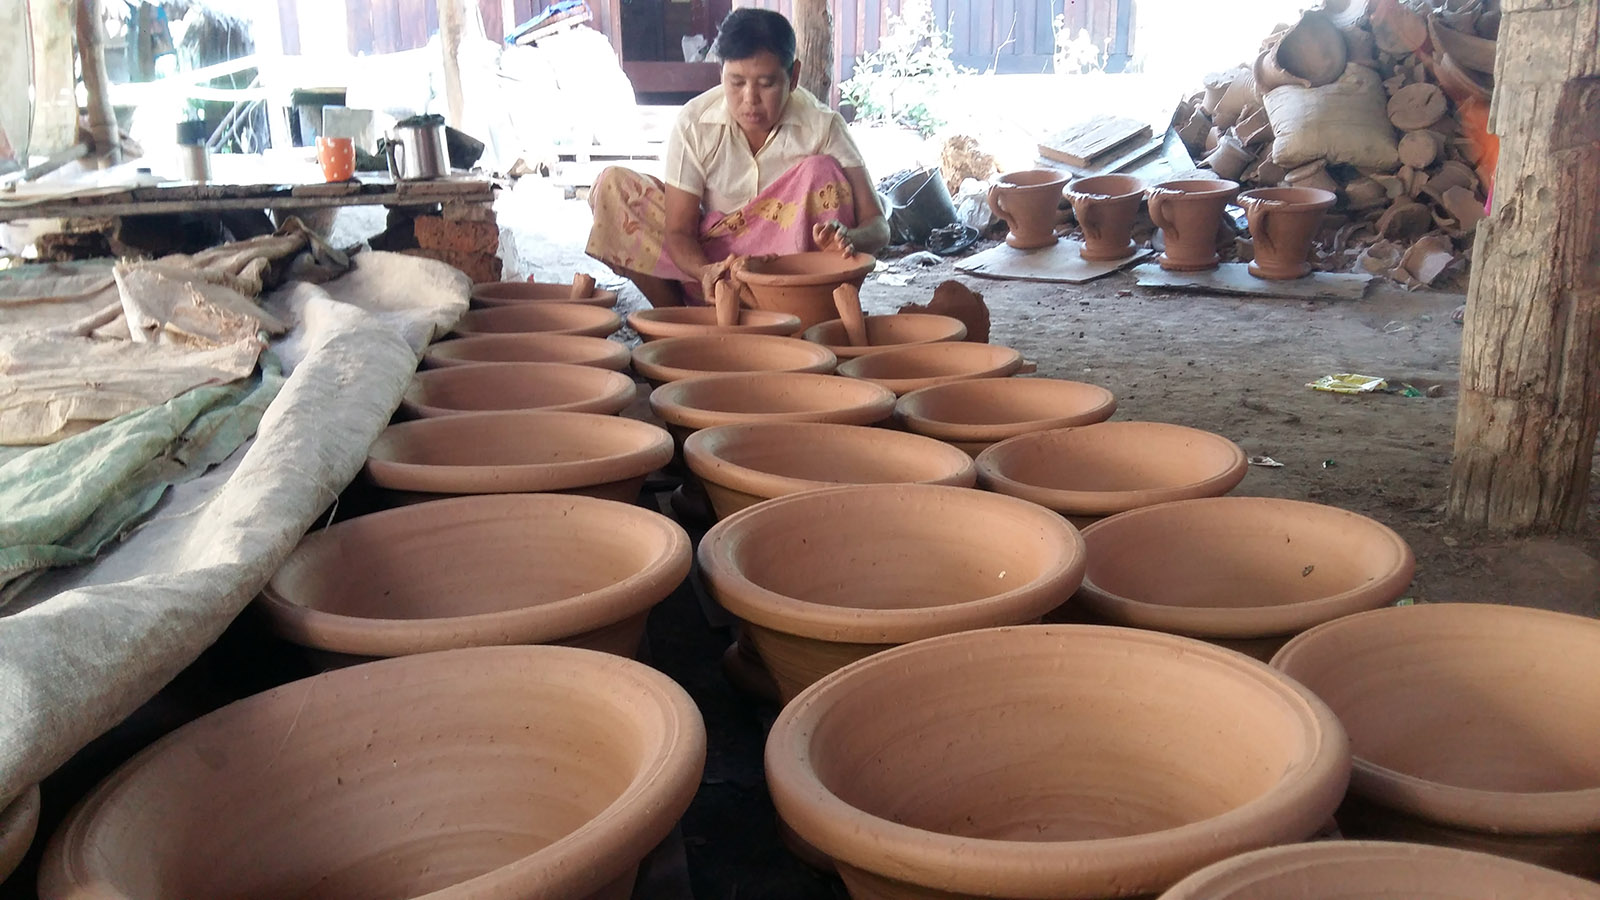 A glazed earthenware workplace is seen in Pathein.Photo: Myint Han (Pathein-IPRD)